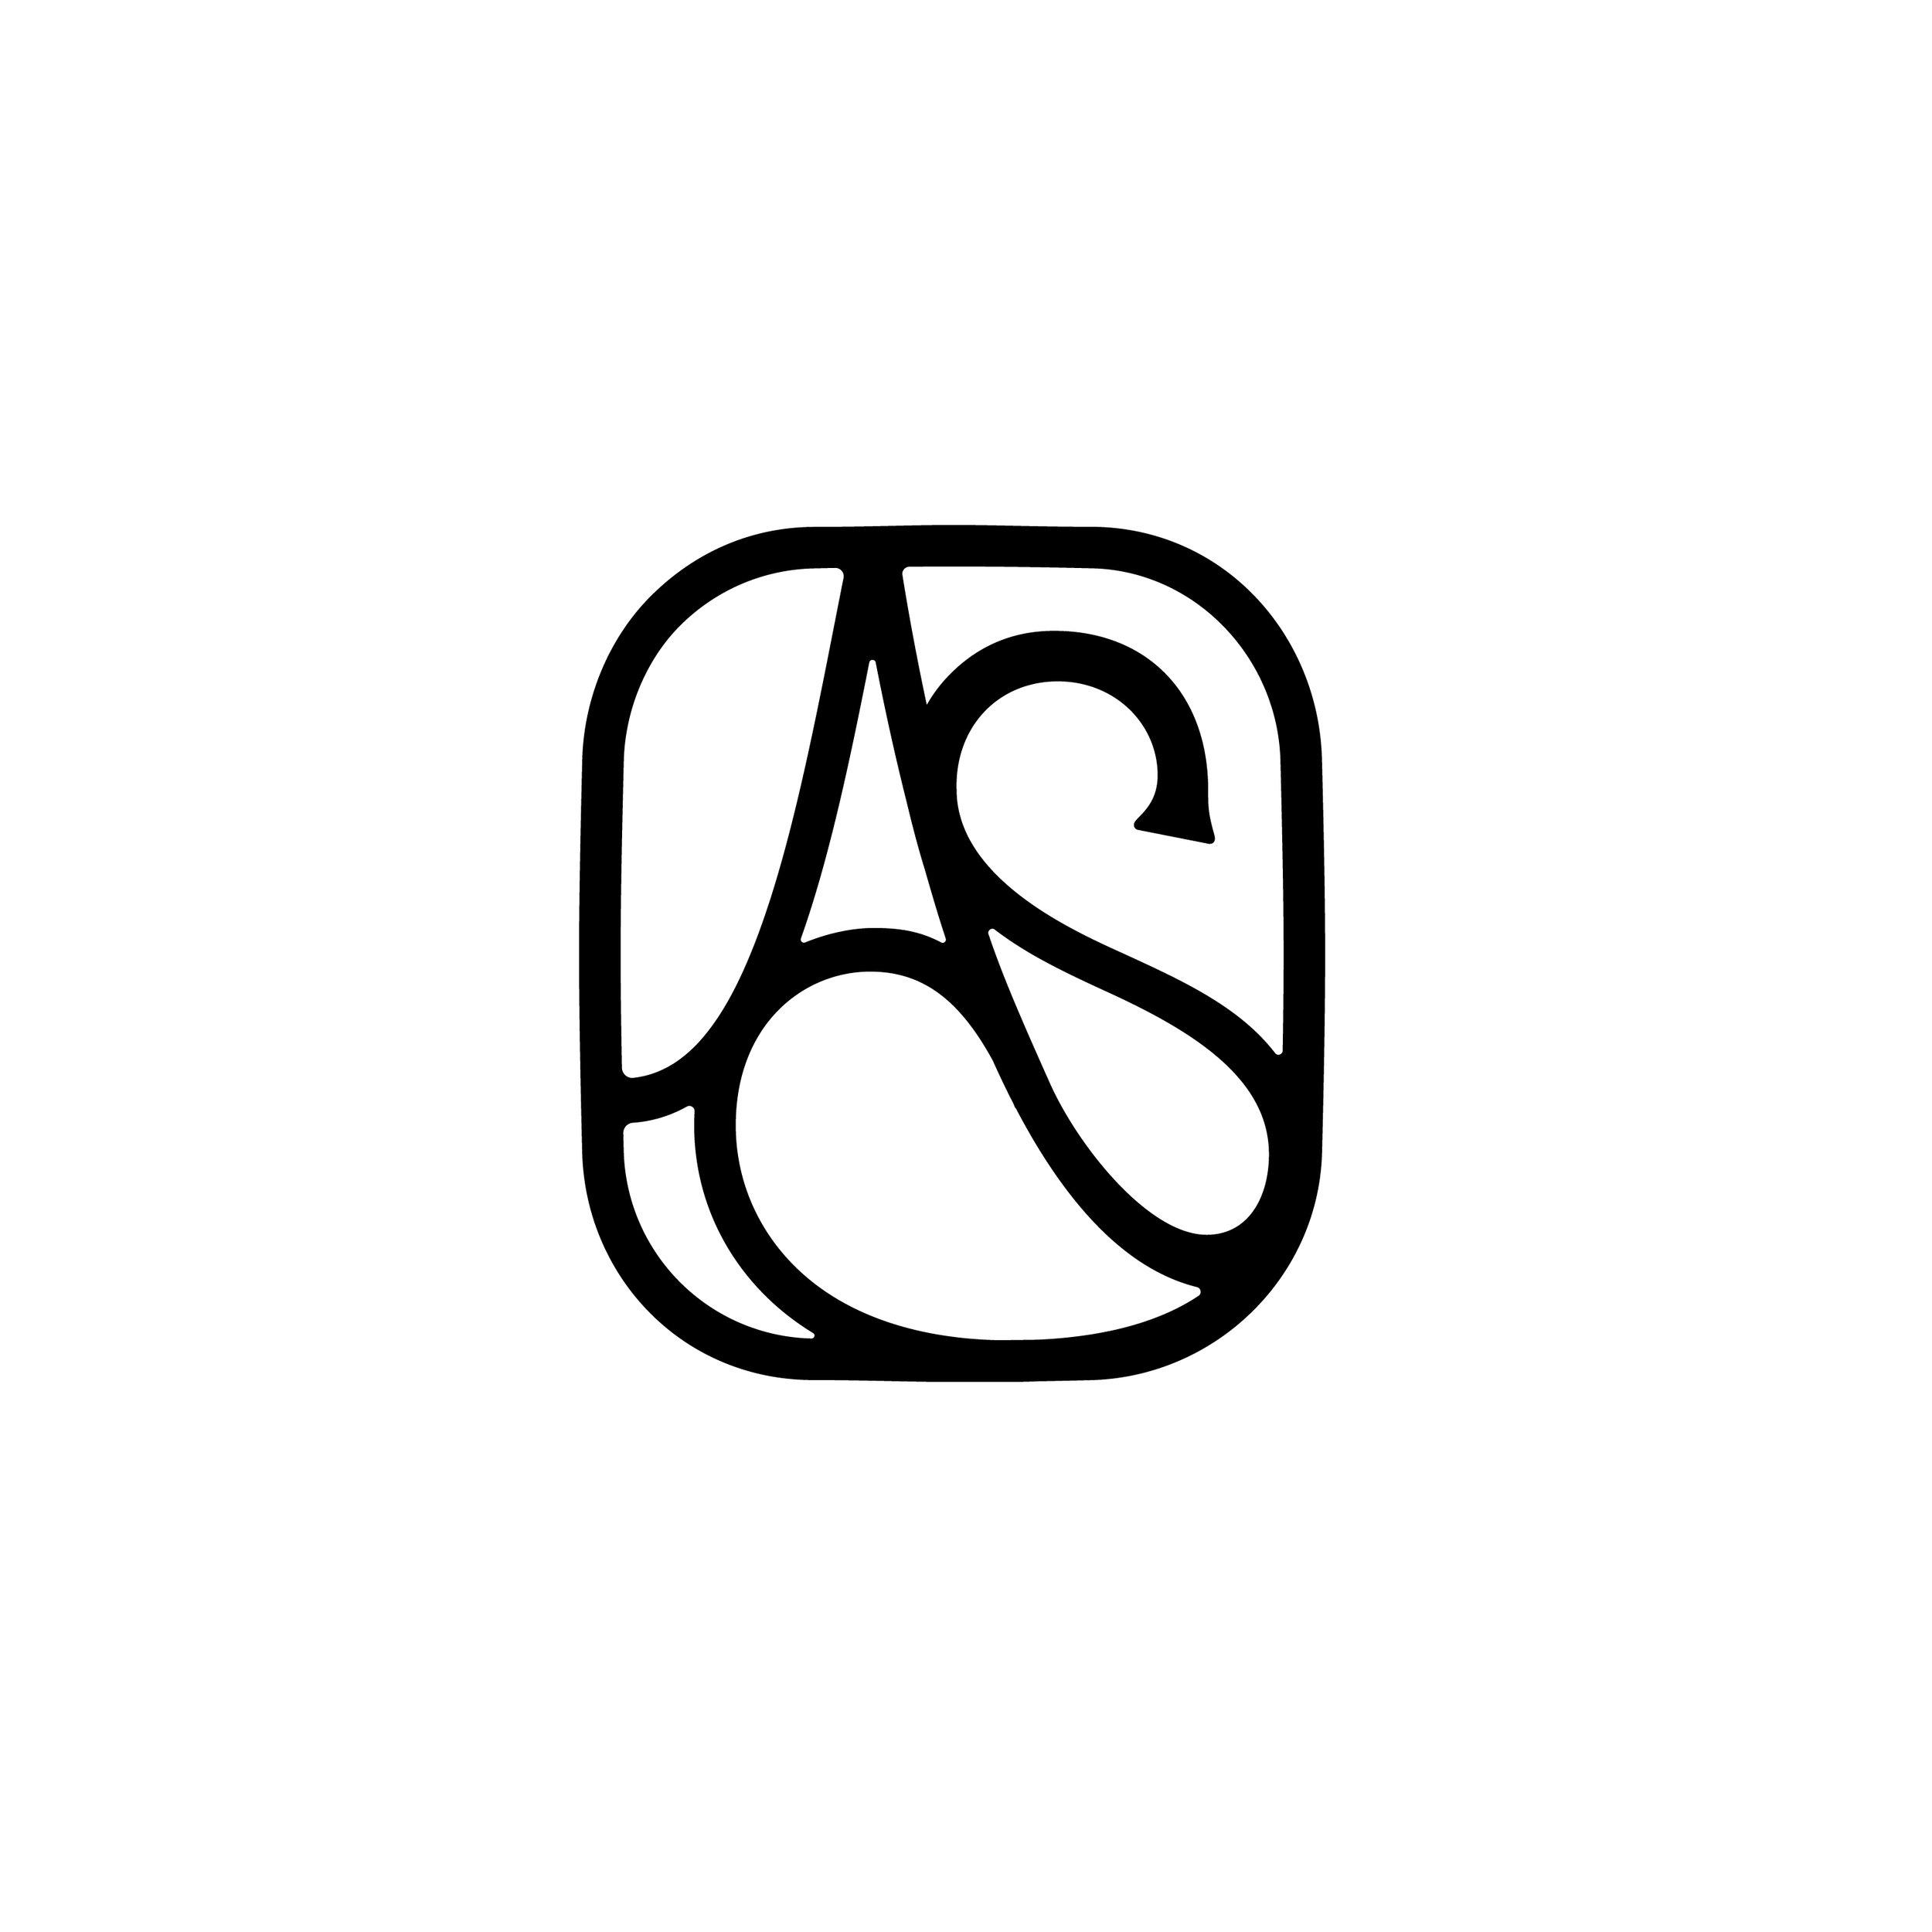 As Monogram The Design Studio Of Jeremy Friend